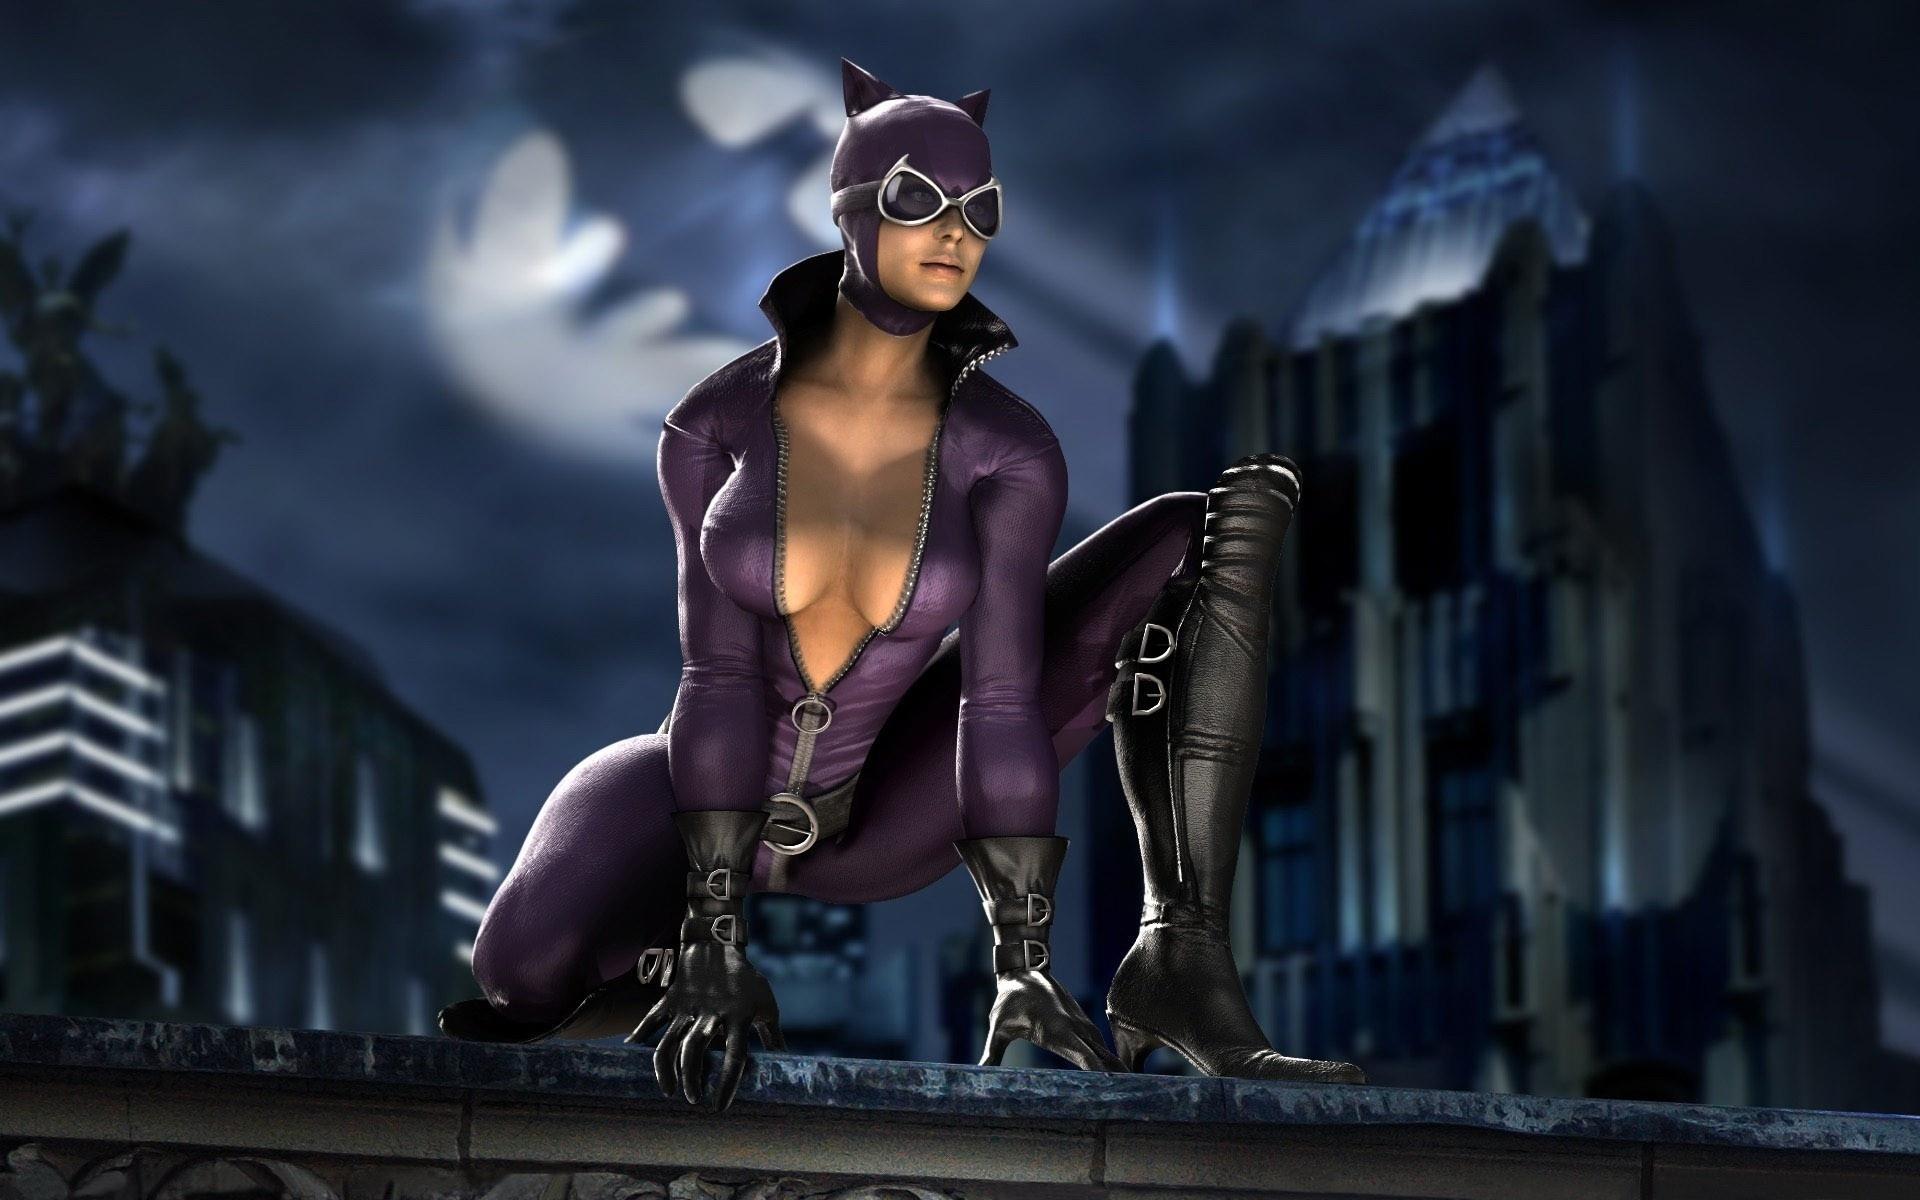 героиня, женщина, кошка, бэтмен, на крыше, поза, костюм, dc, catwoman, женщина-кошка